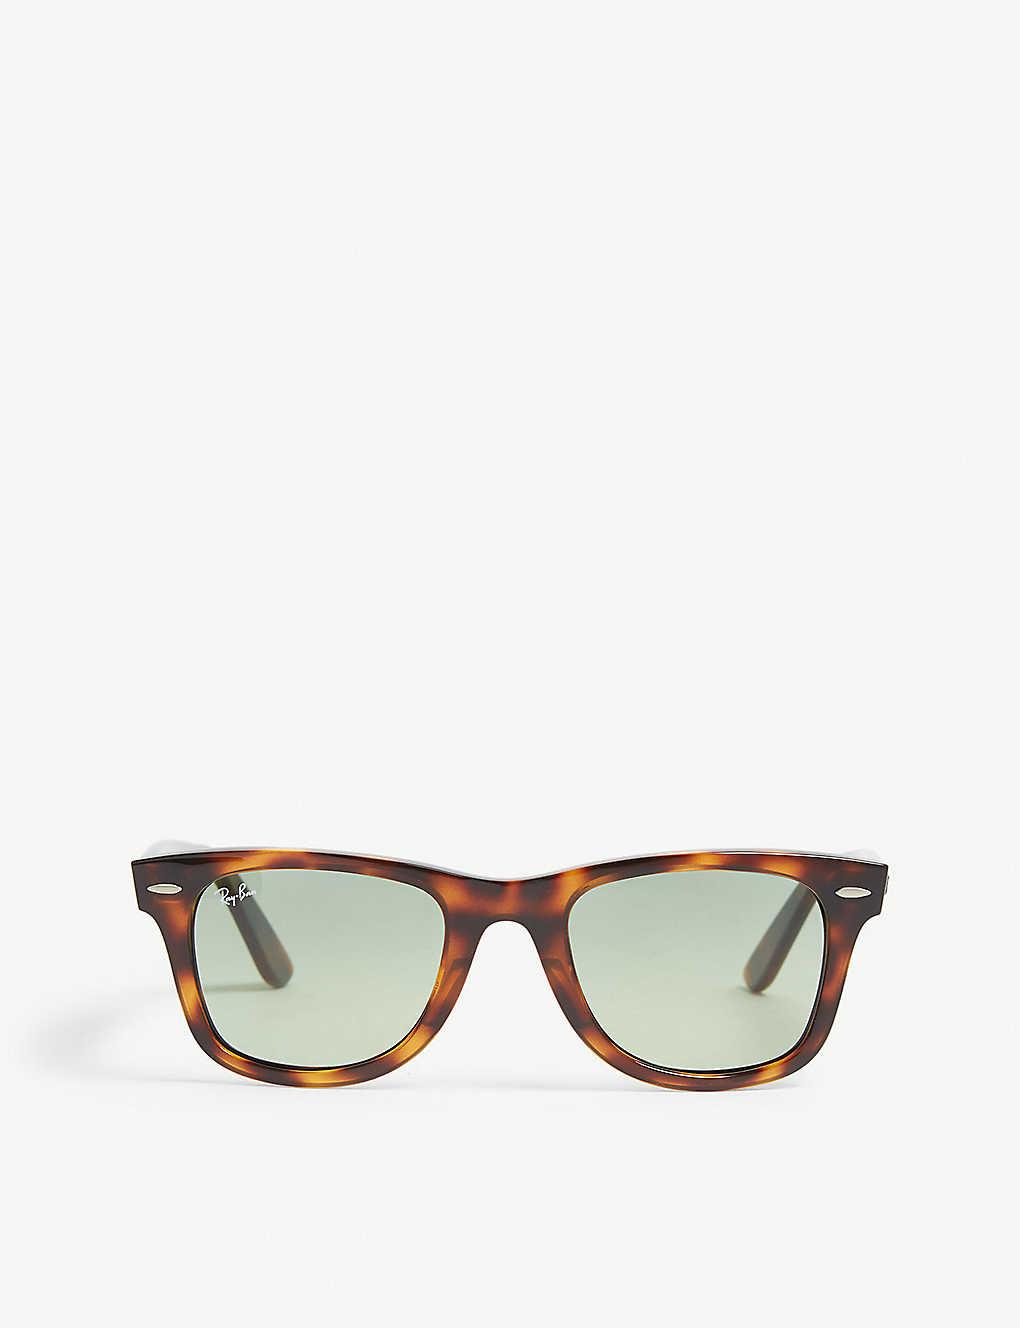 cc8a74fa448f RAY-BAN - RB4340 Wayfarer Havana sunglasses   Selfridges.com